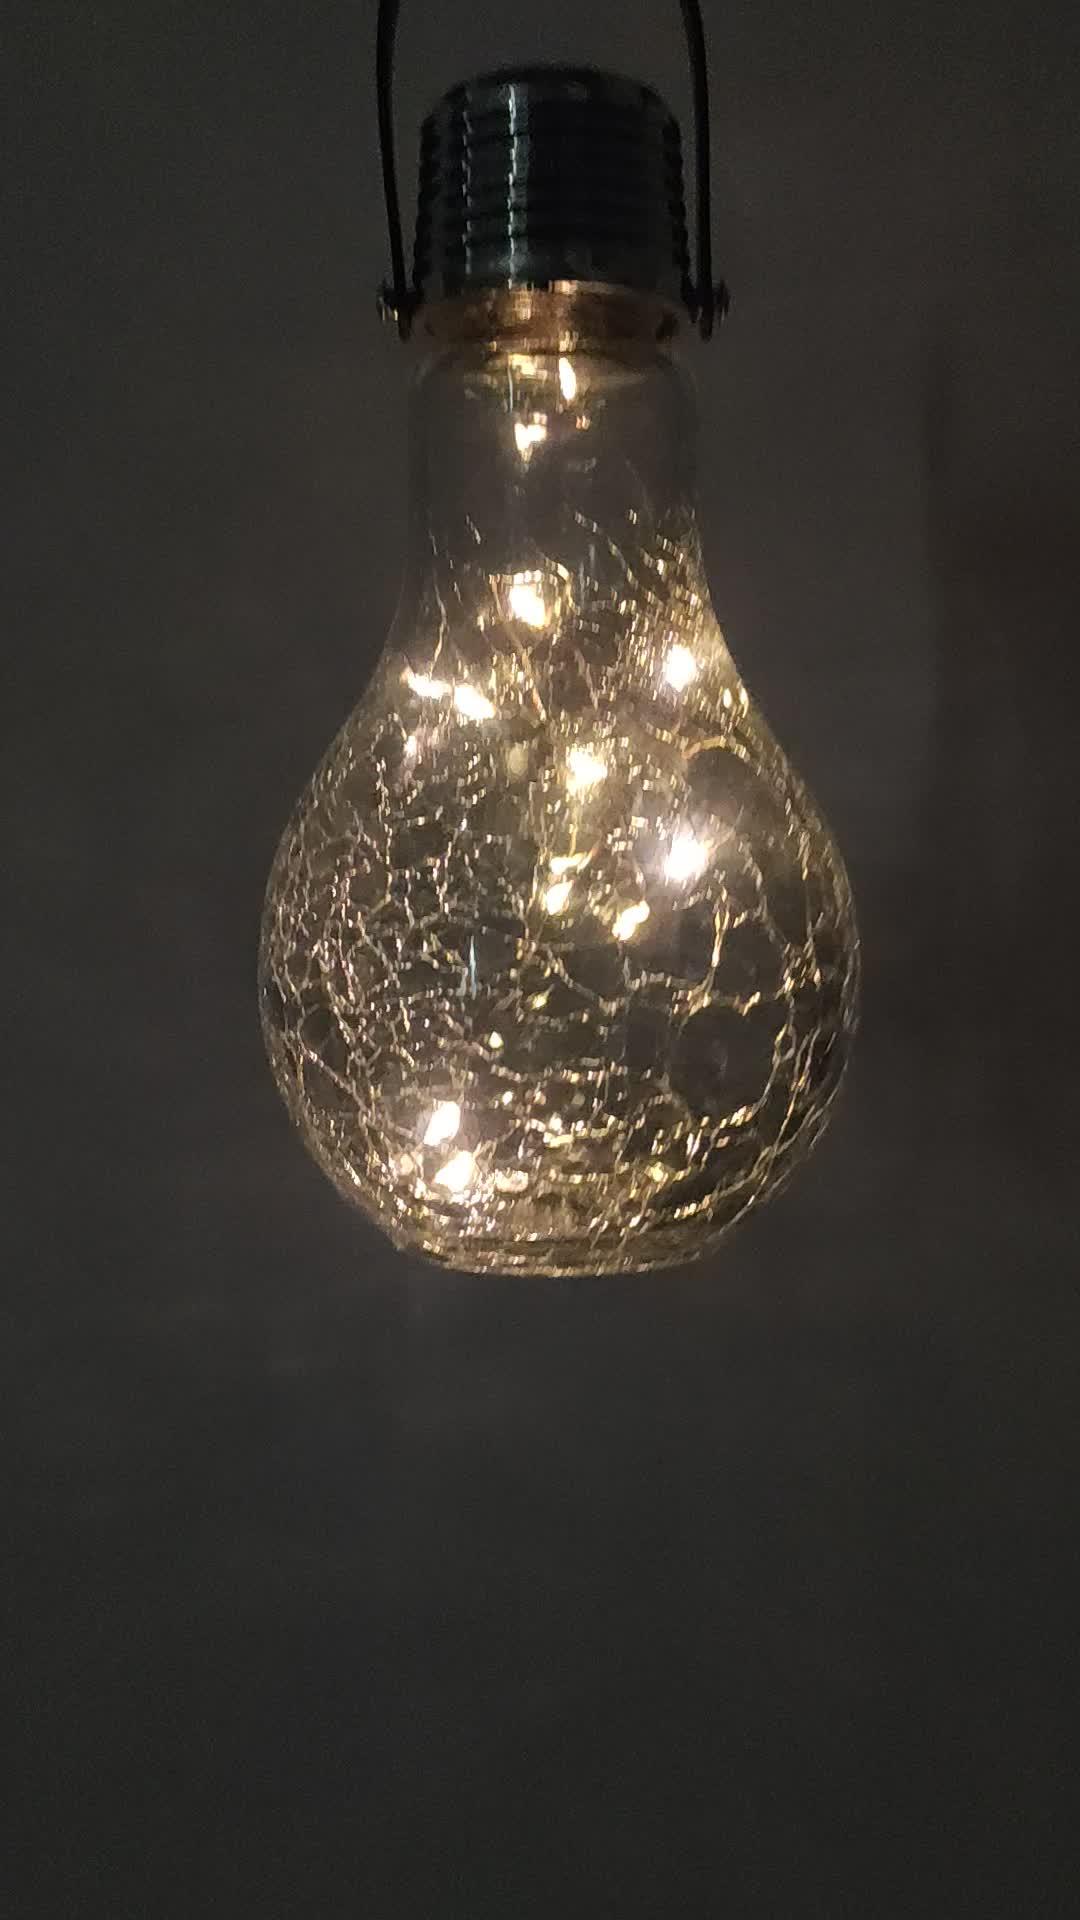 2020 New Solar LED crackled แก้วแขวนพลังงานแสงอาทิตย์แขวนโคมไฟจี้โคมไฟสำหรับห้องรับแขกโรงแรม